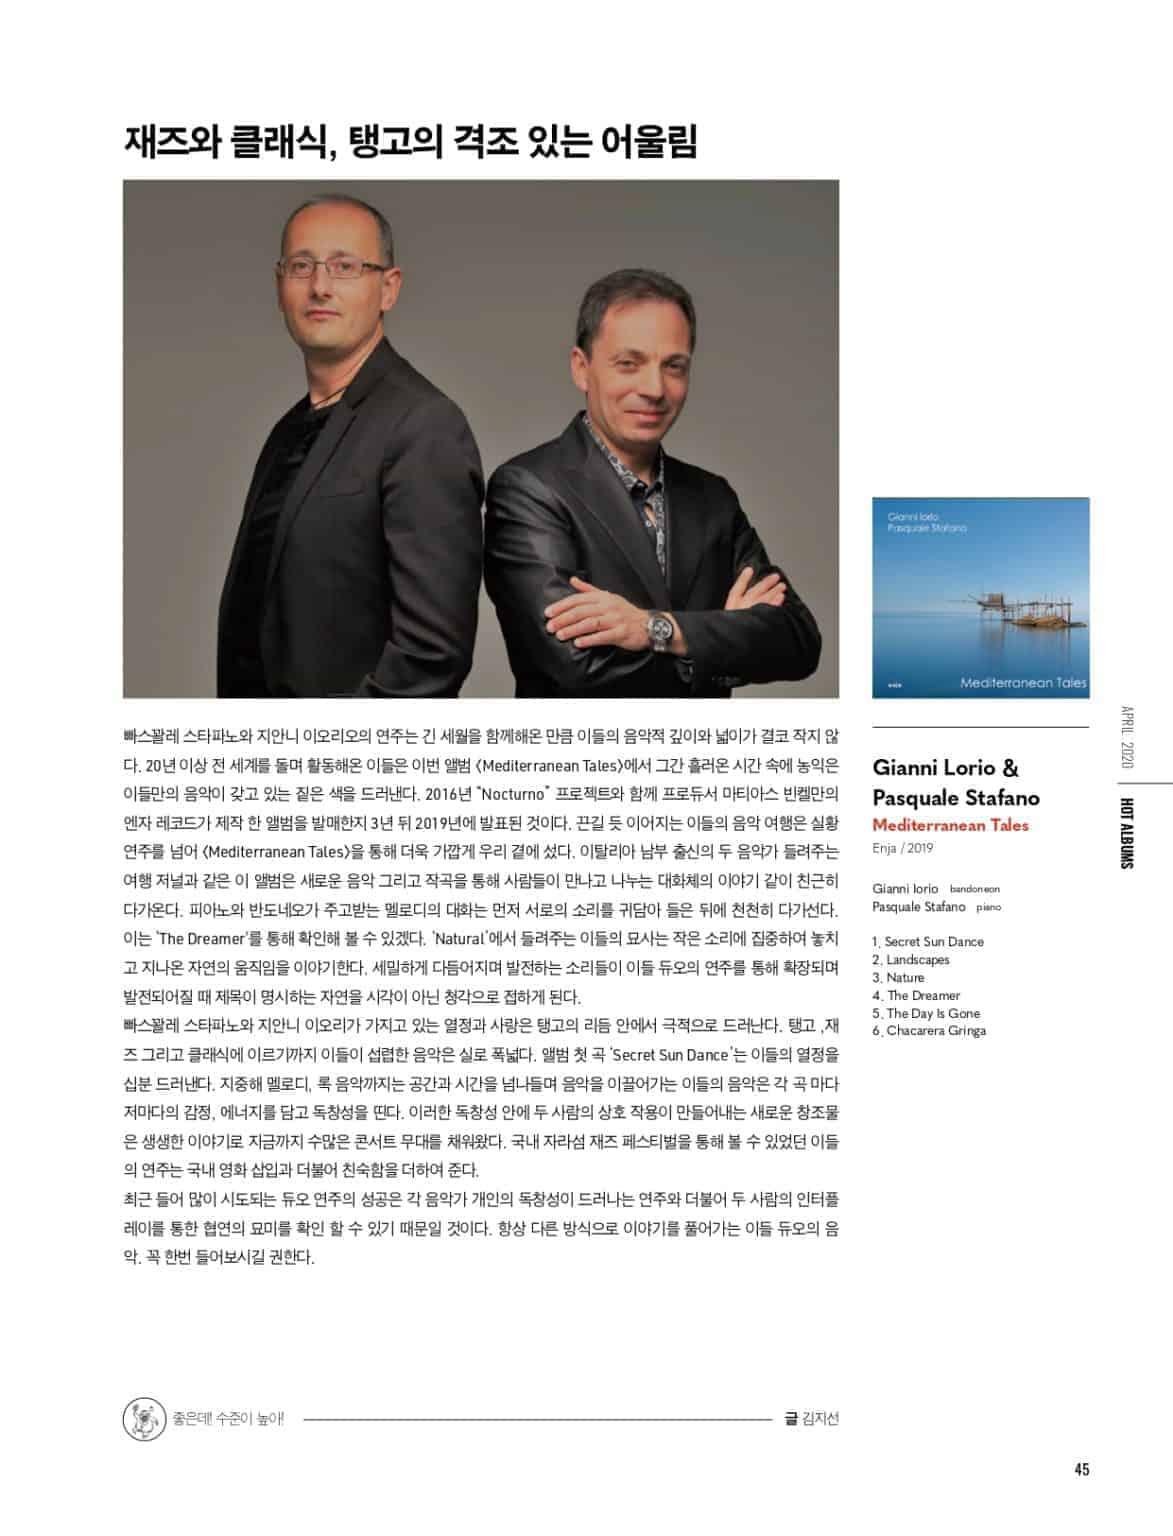 MM Jazz Magazine - Pasquale Stafano & Gianni Iorio